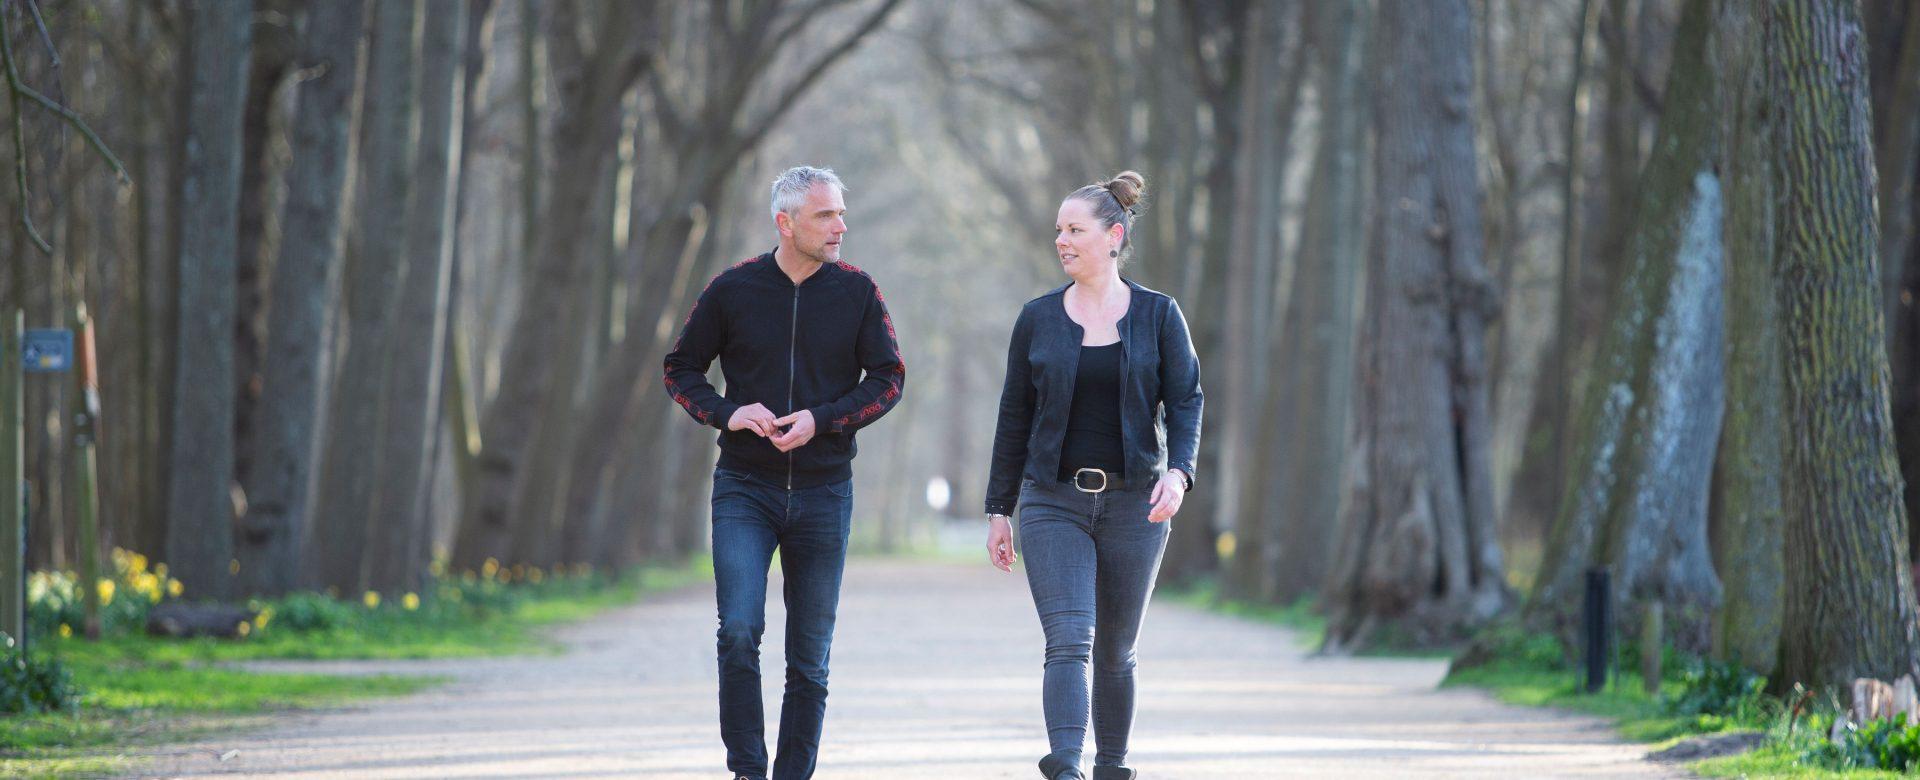 Coaching by Wouter in Zeeland Goes